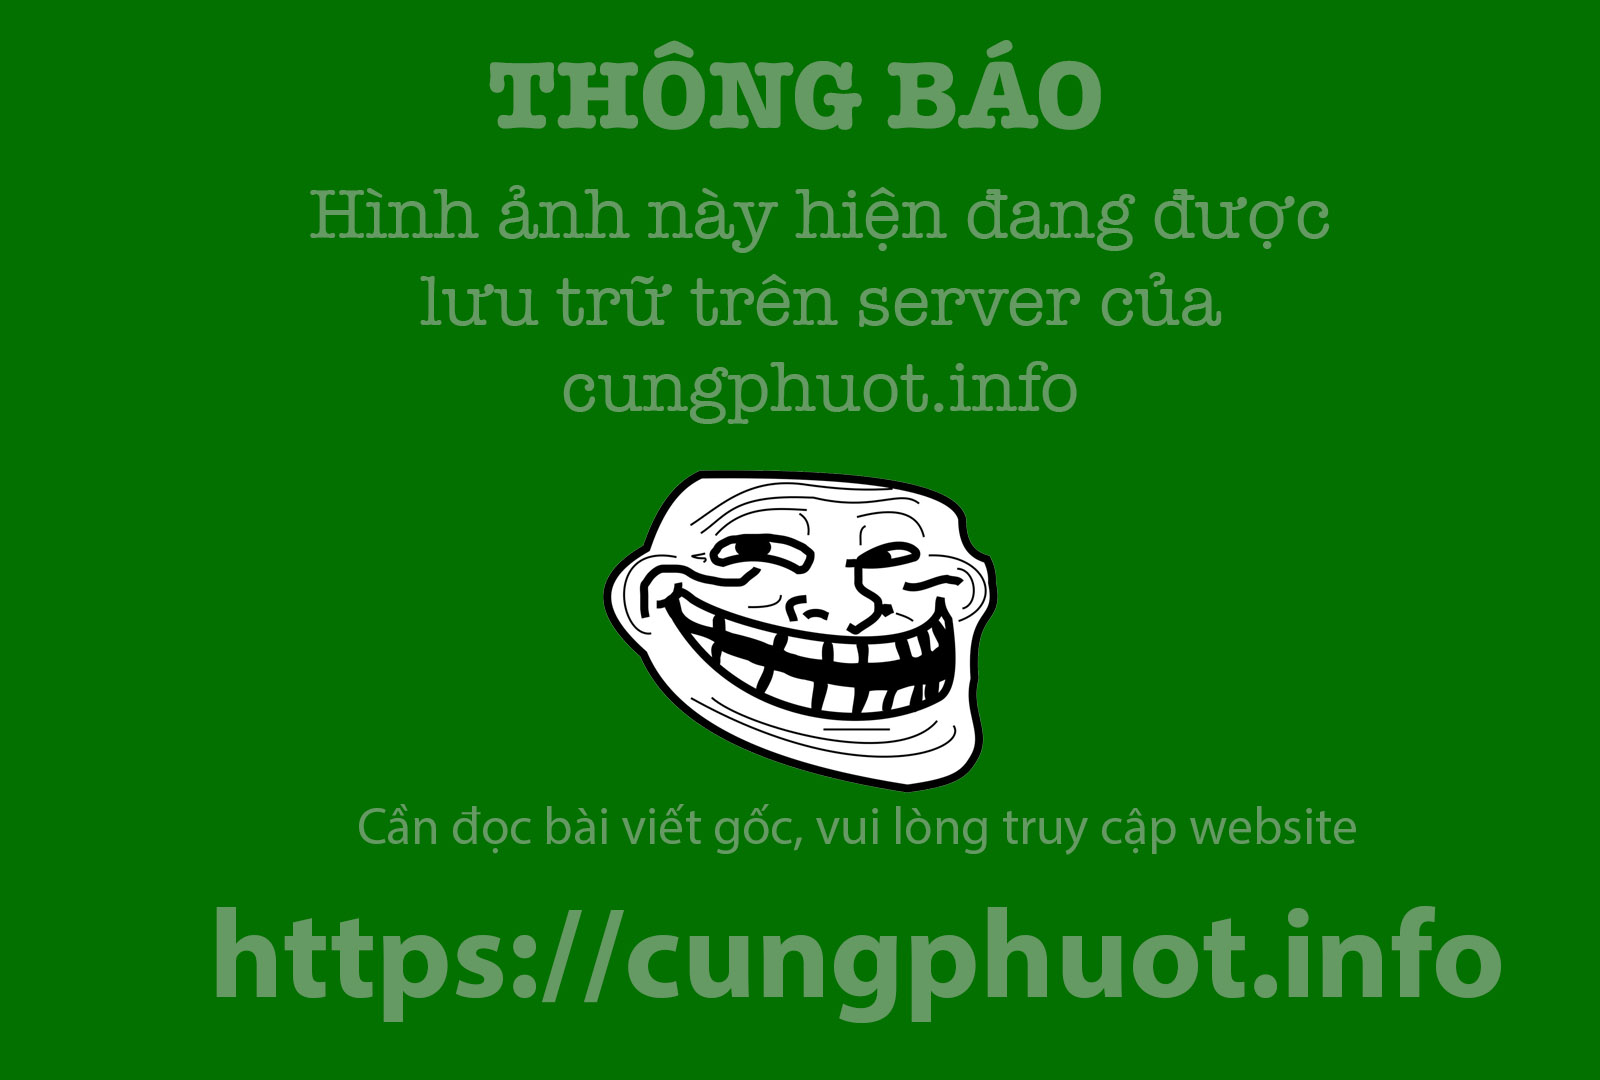 Co do Hue dep la trong suong mu hinh anh 10